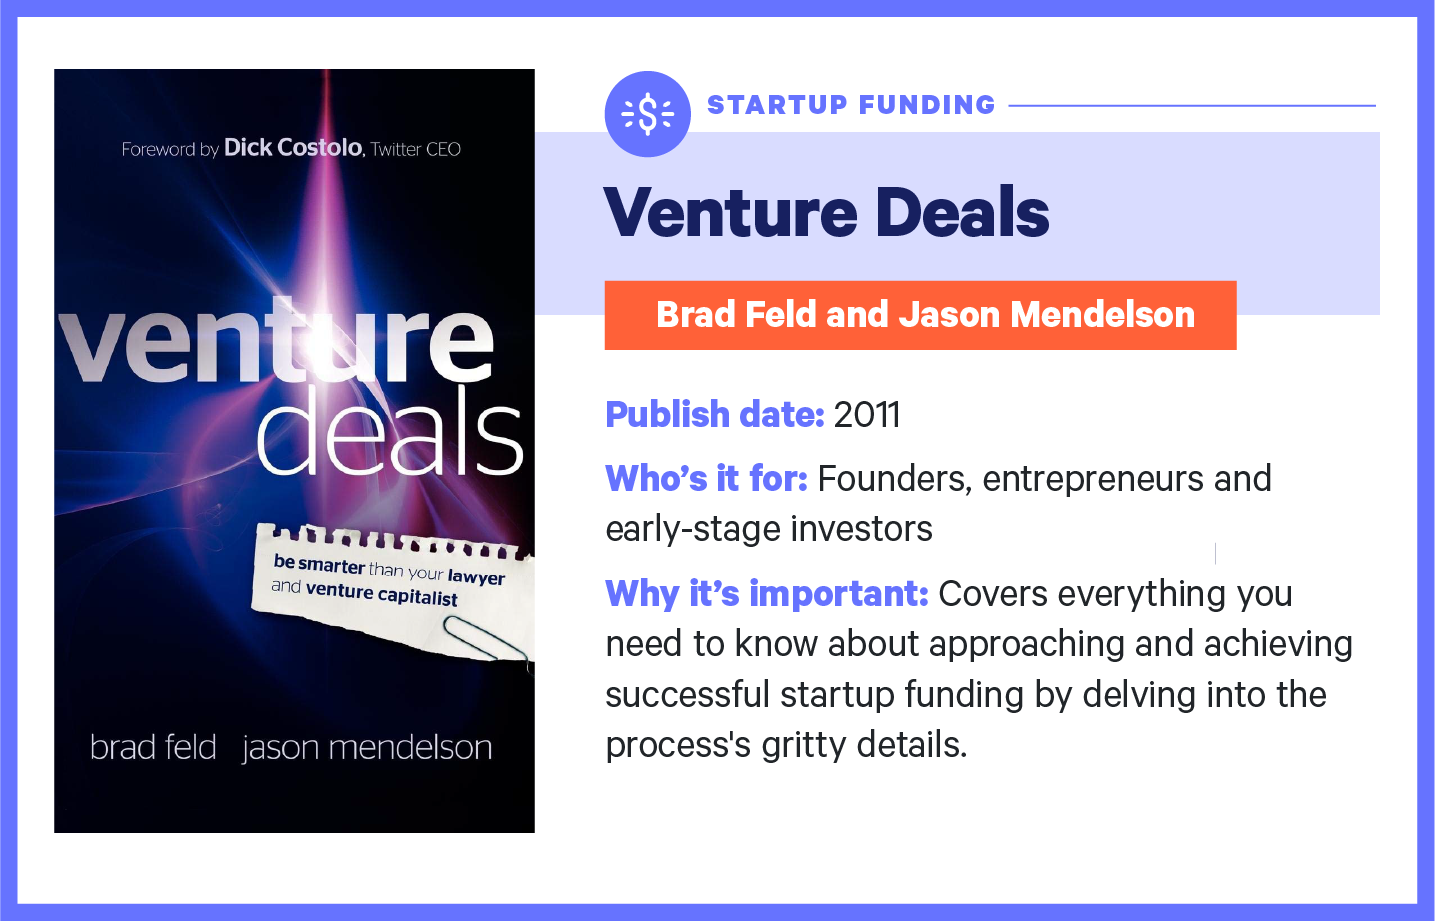 venture deals book